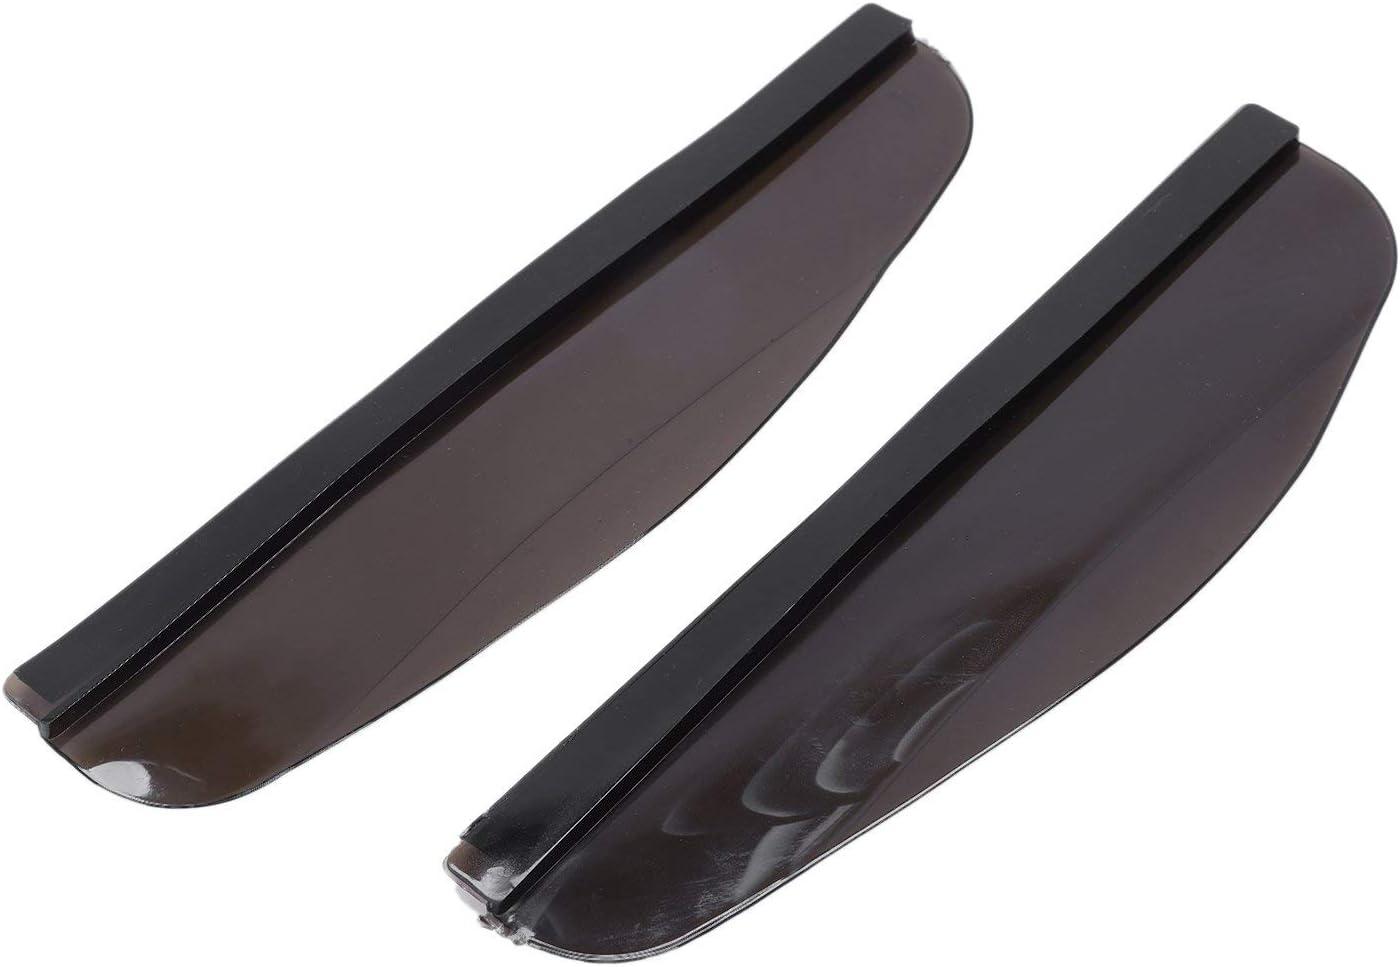 Bestlymood Universal Flexible PVC Car Rear-view Mirror Rain Shade Rainproof Blades Car Back Mirror Eyebrow Rain Cover Black